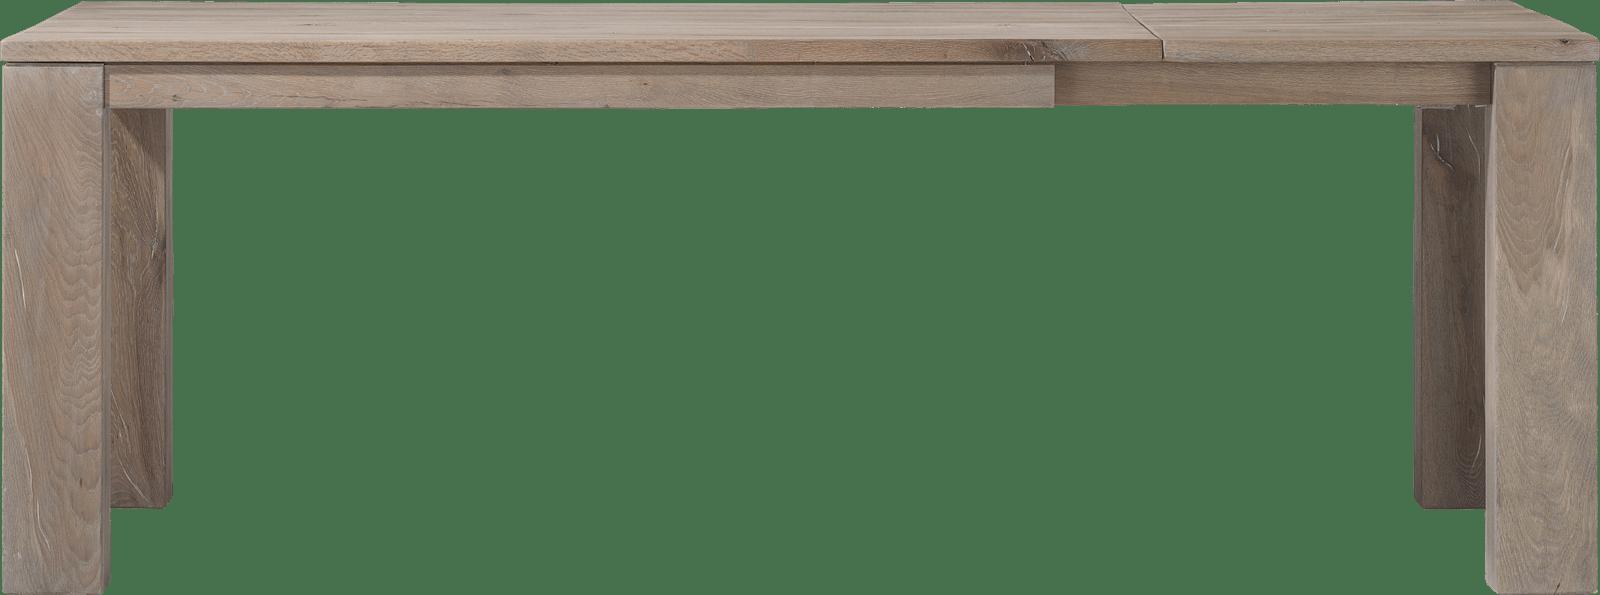 Masters - uitschuiftafel 160 (+ 60) x 90 - hout 12x12/10x14